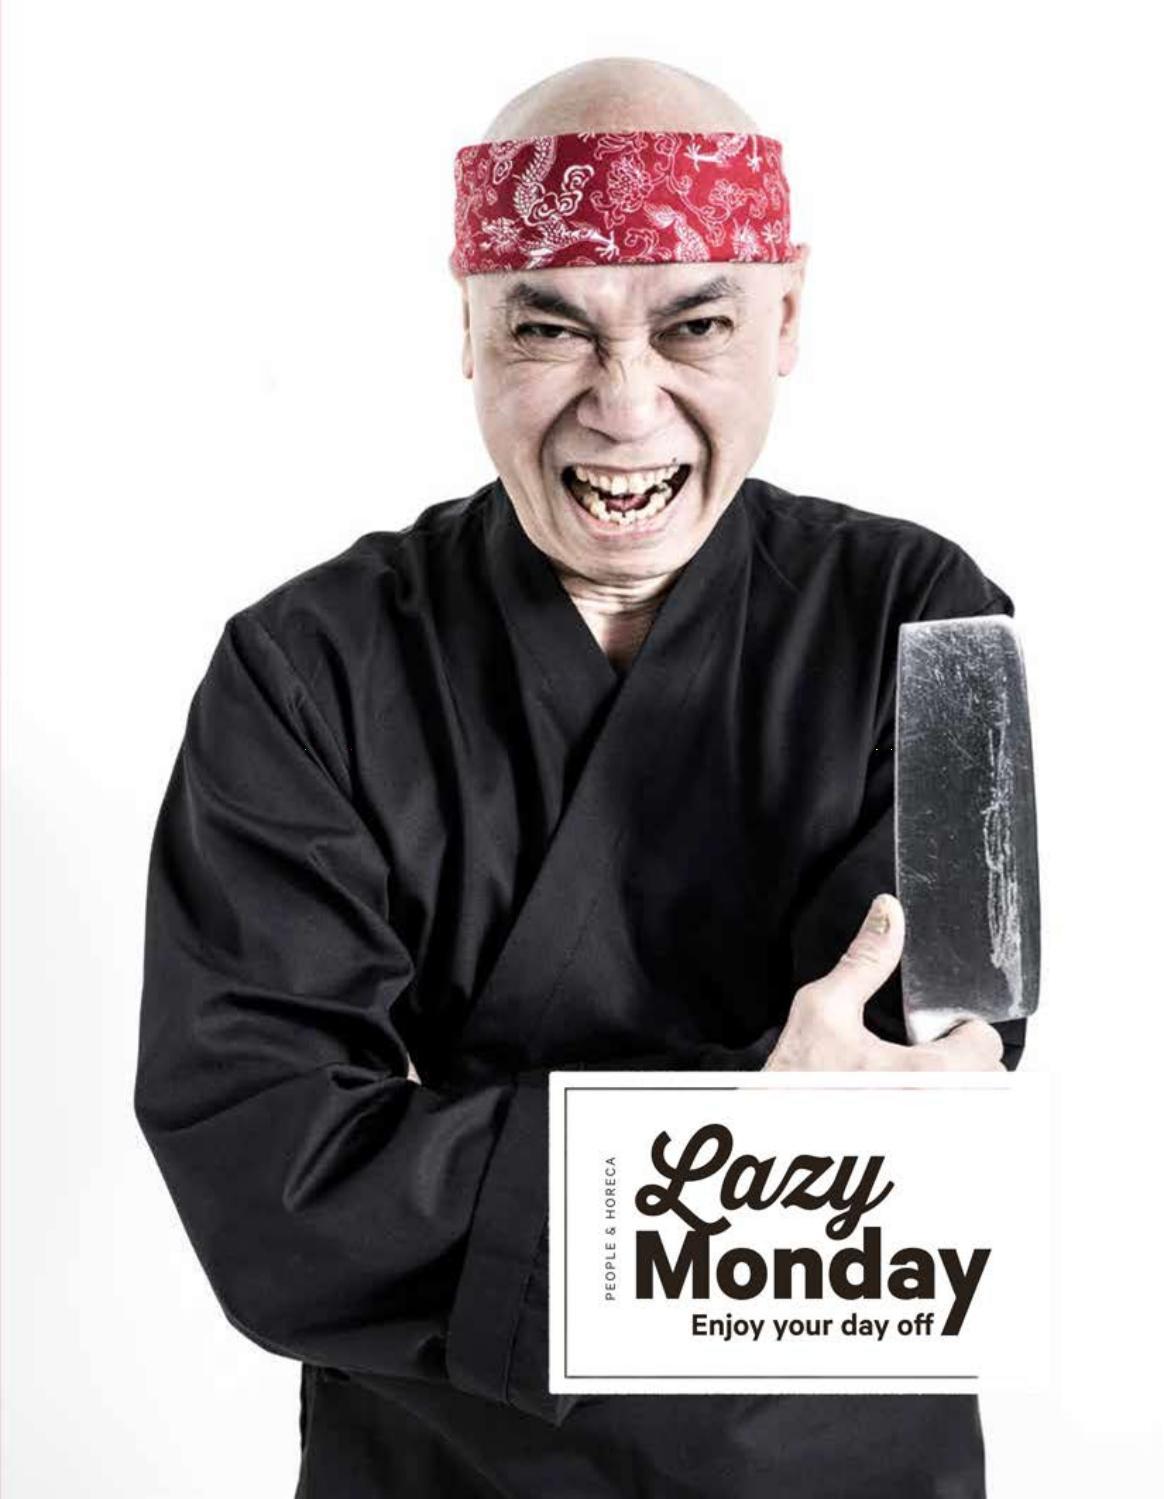 Lazy monday # 003 by lazy monday   issuu